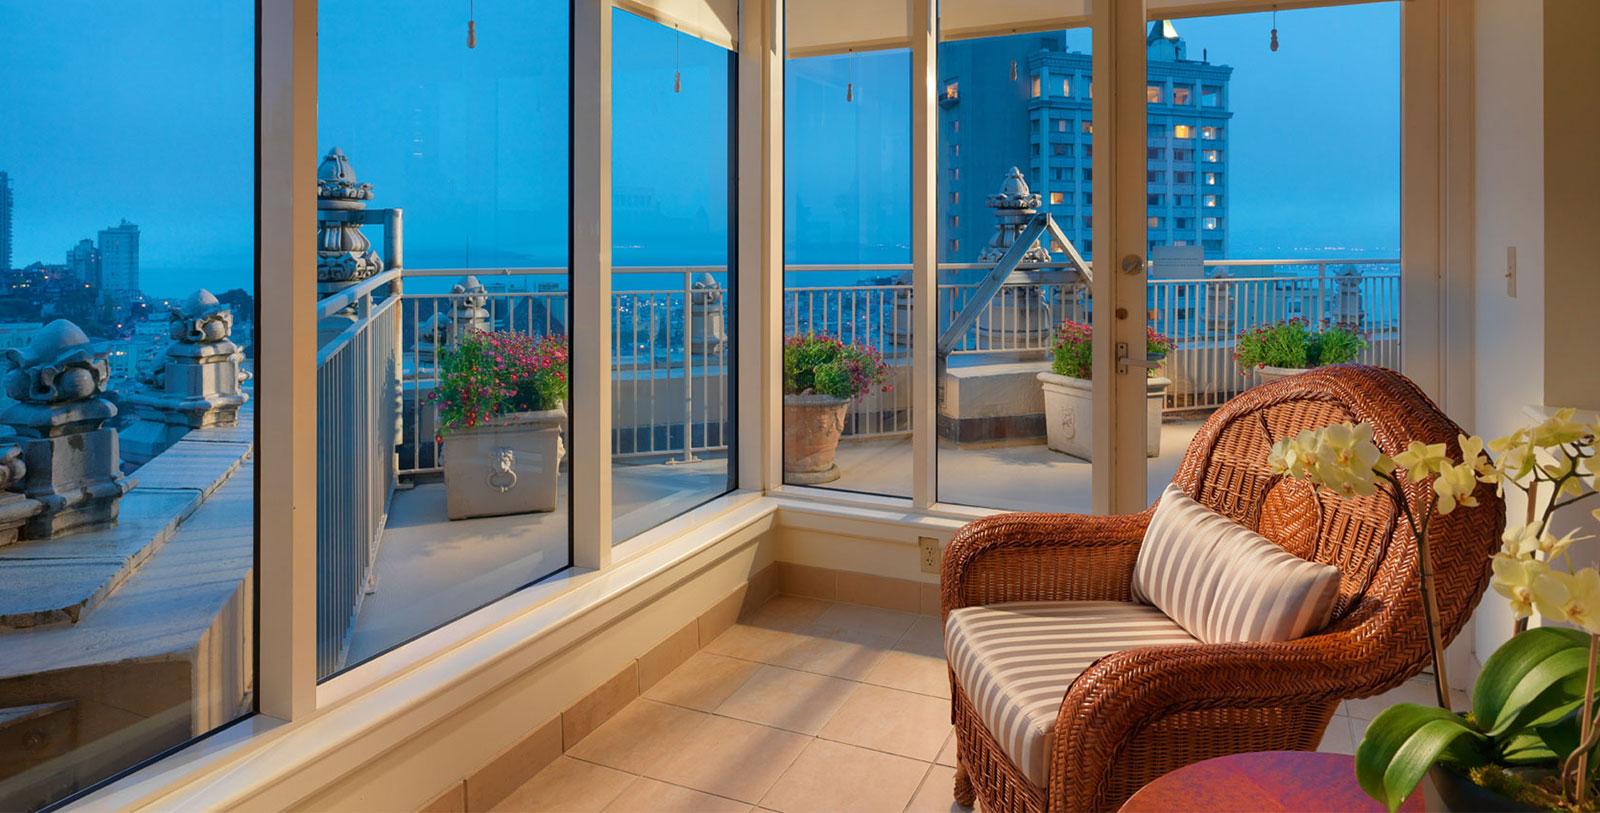 Image of Terrace suite, InterContinental Mark Hopkins Hotel in San Francisco, California, 1926, Member of Historic Hotels of America, Explore